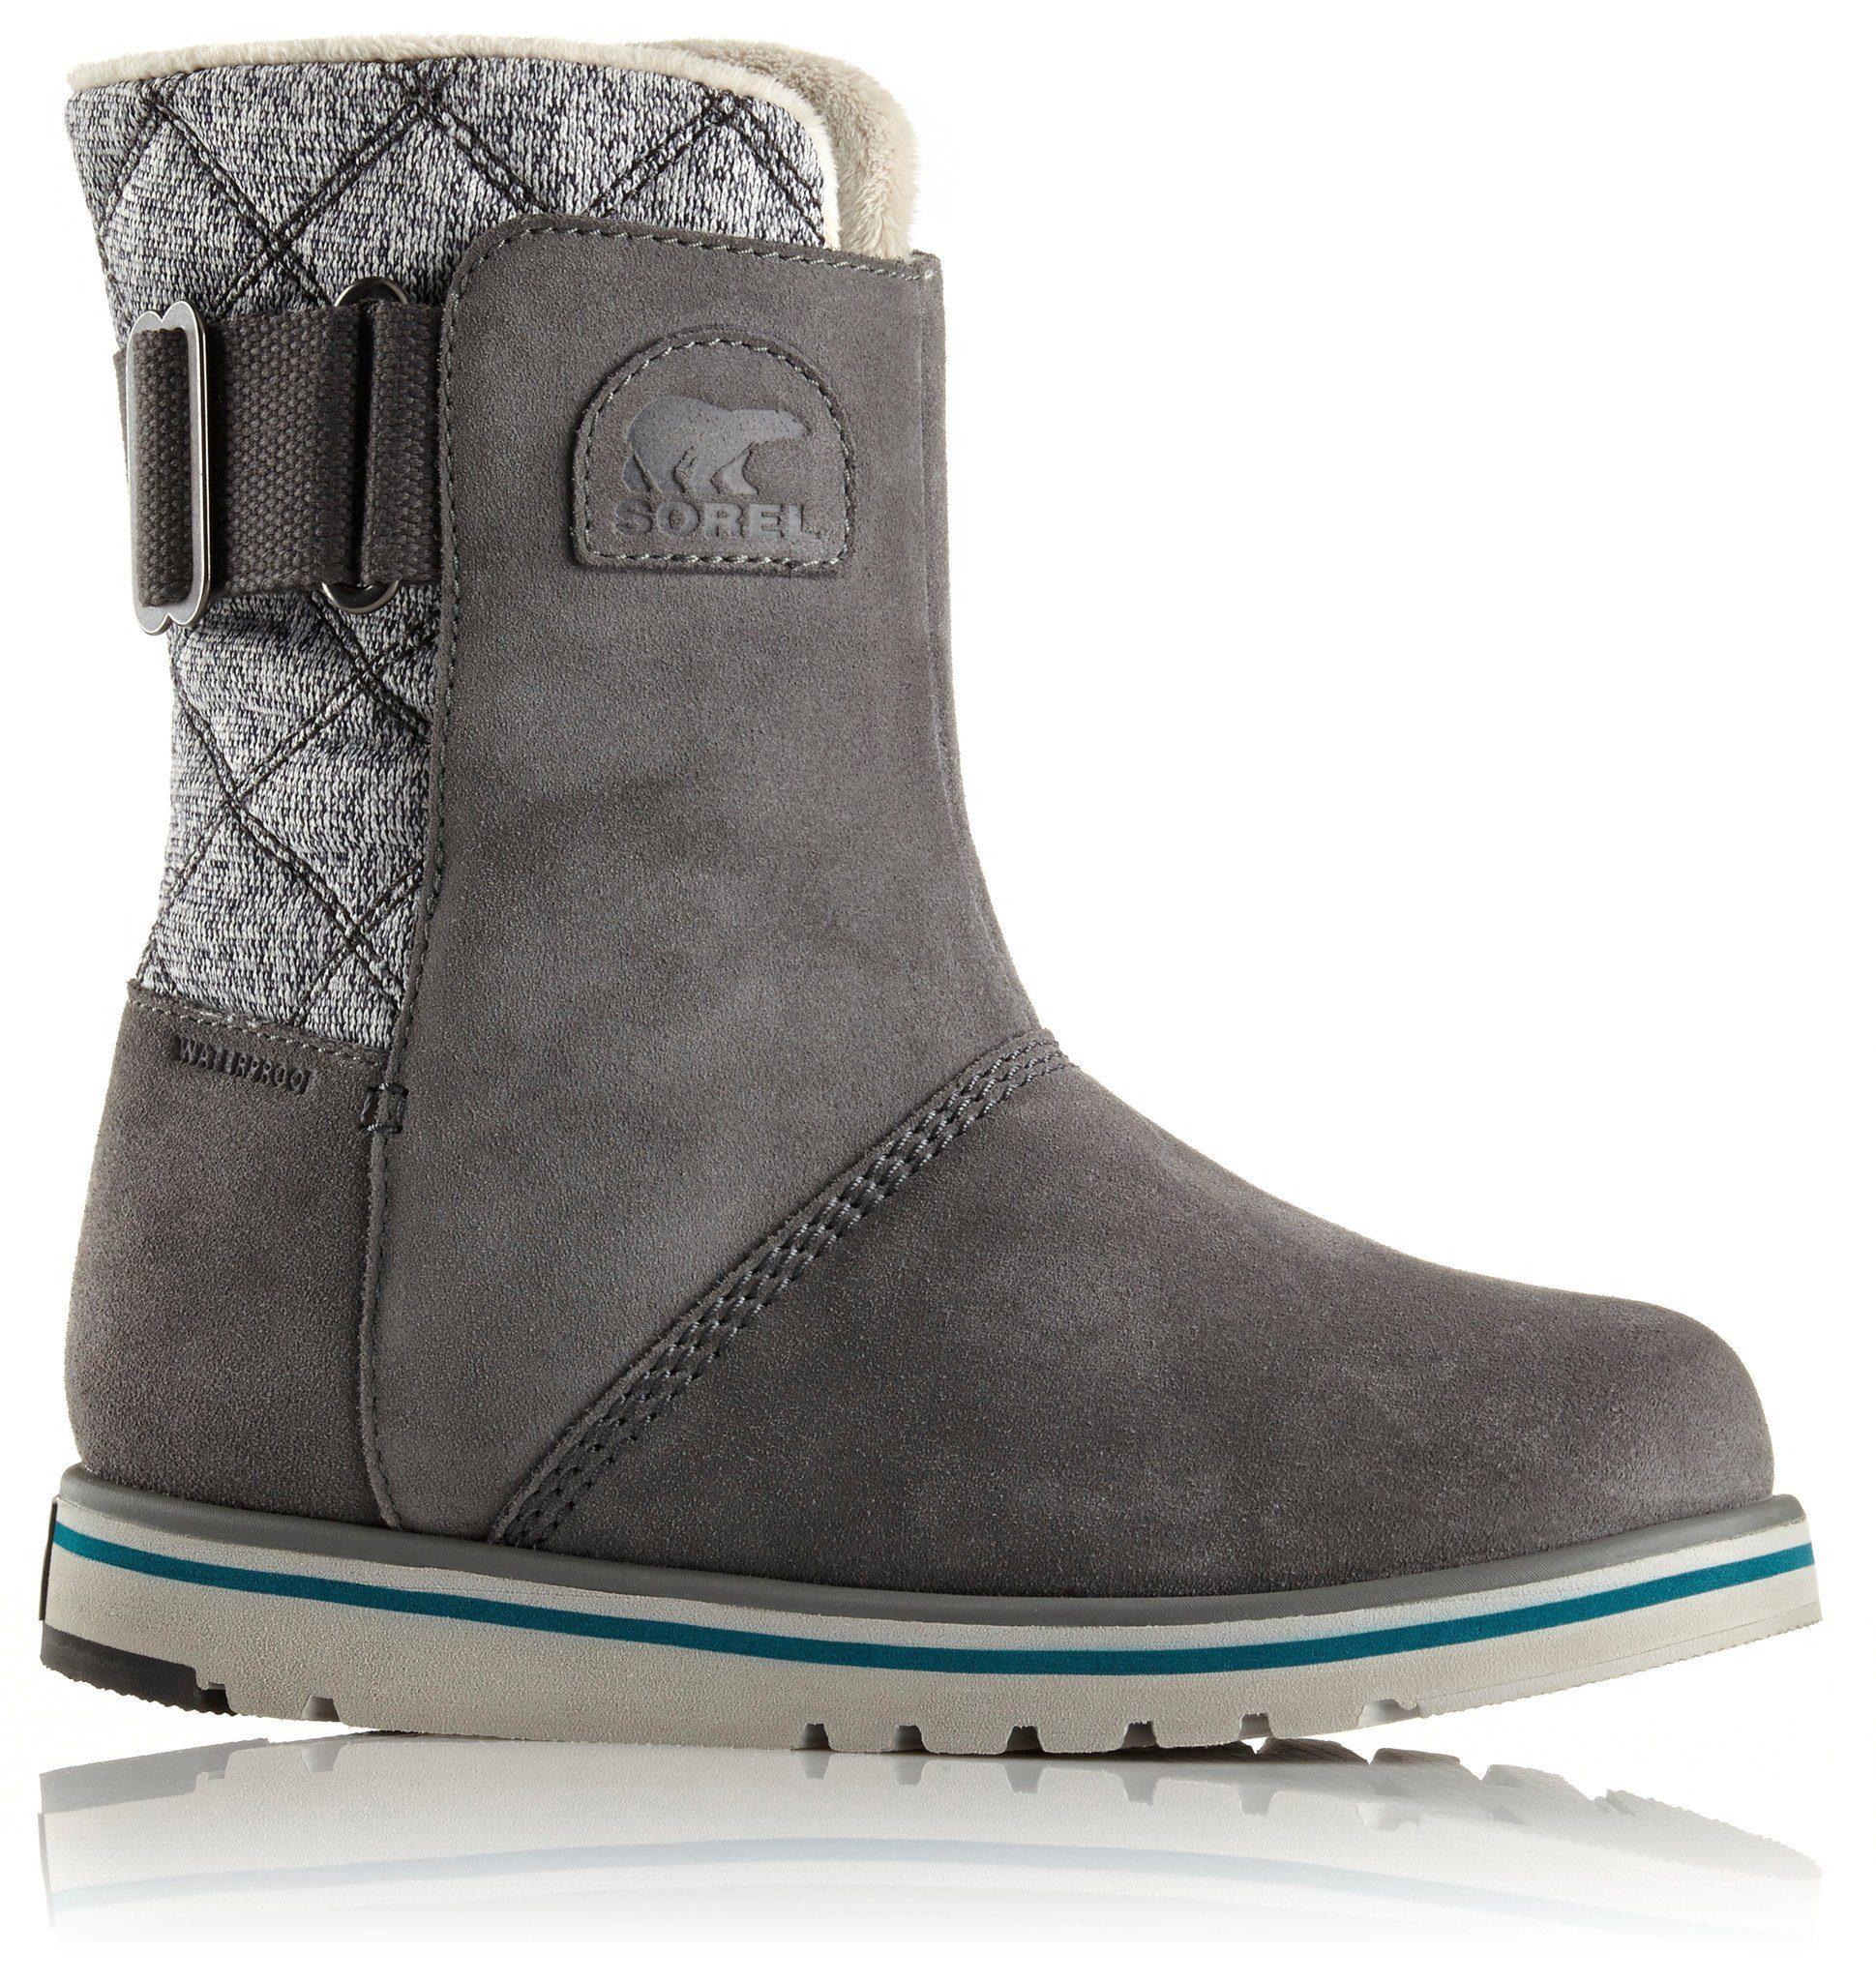 Sorel Winterstiefel Rylee Boots Women kaufen  grau